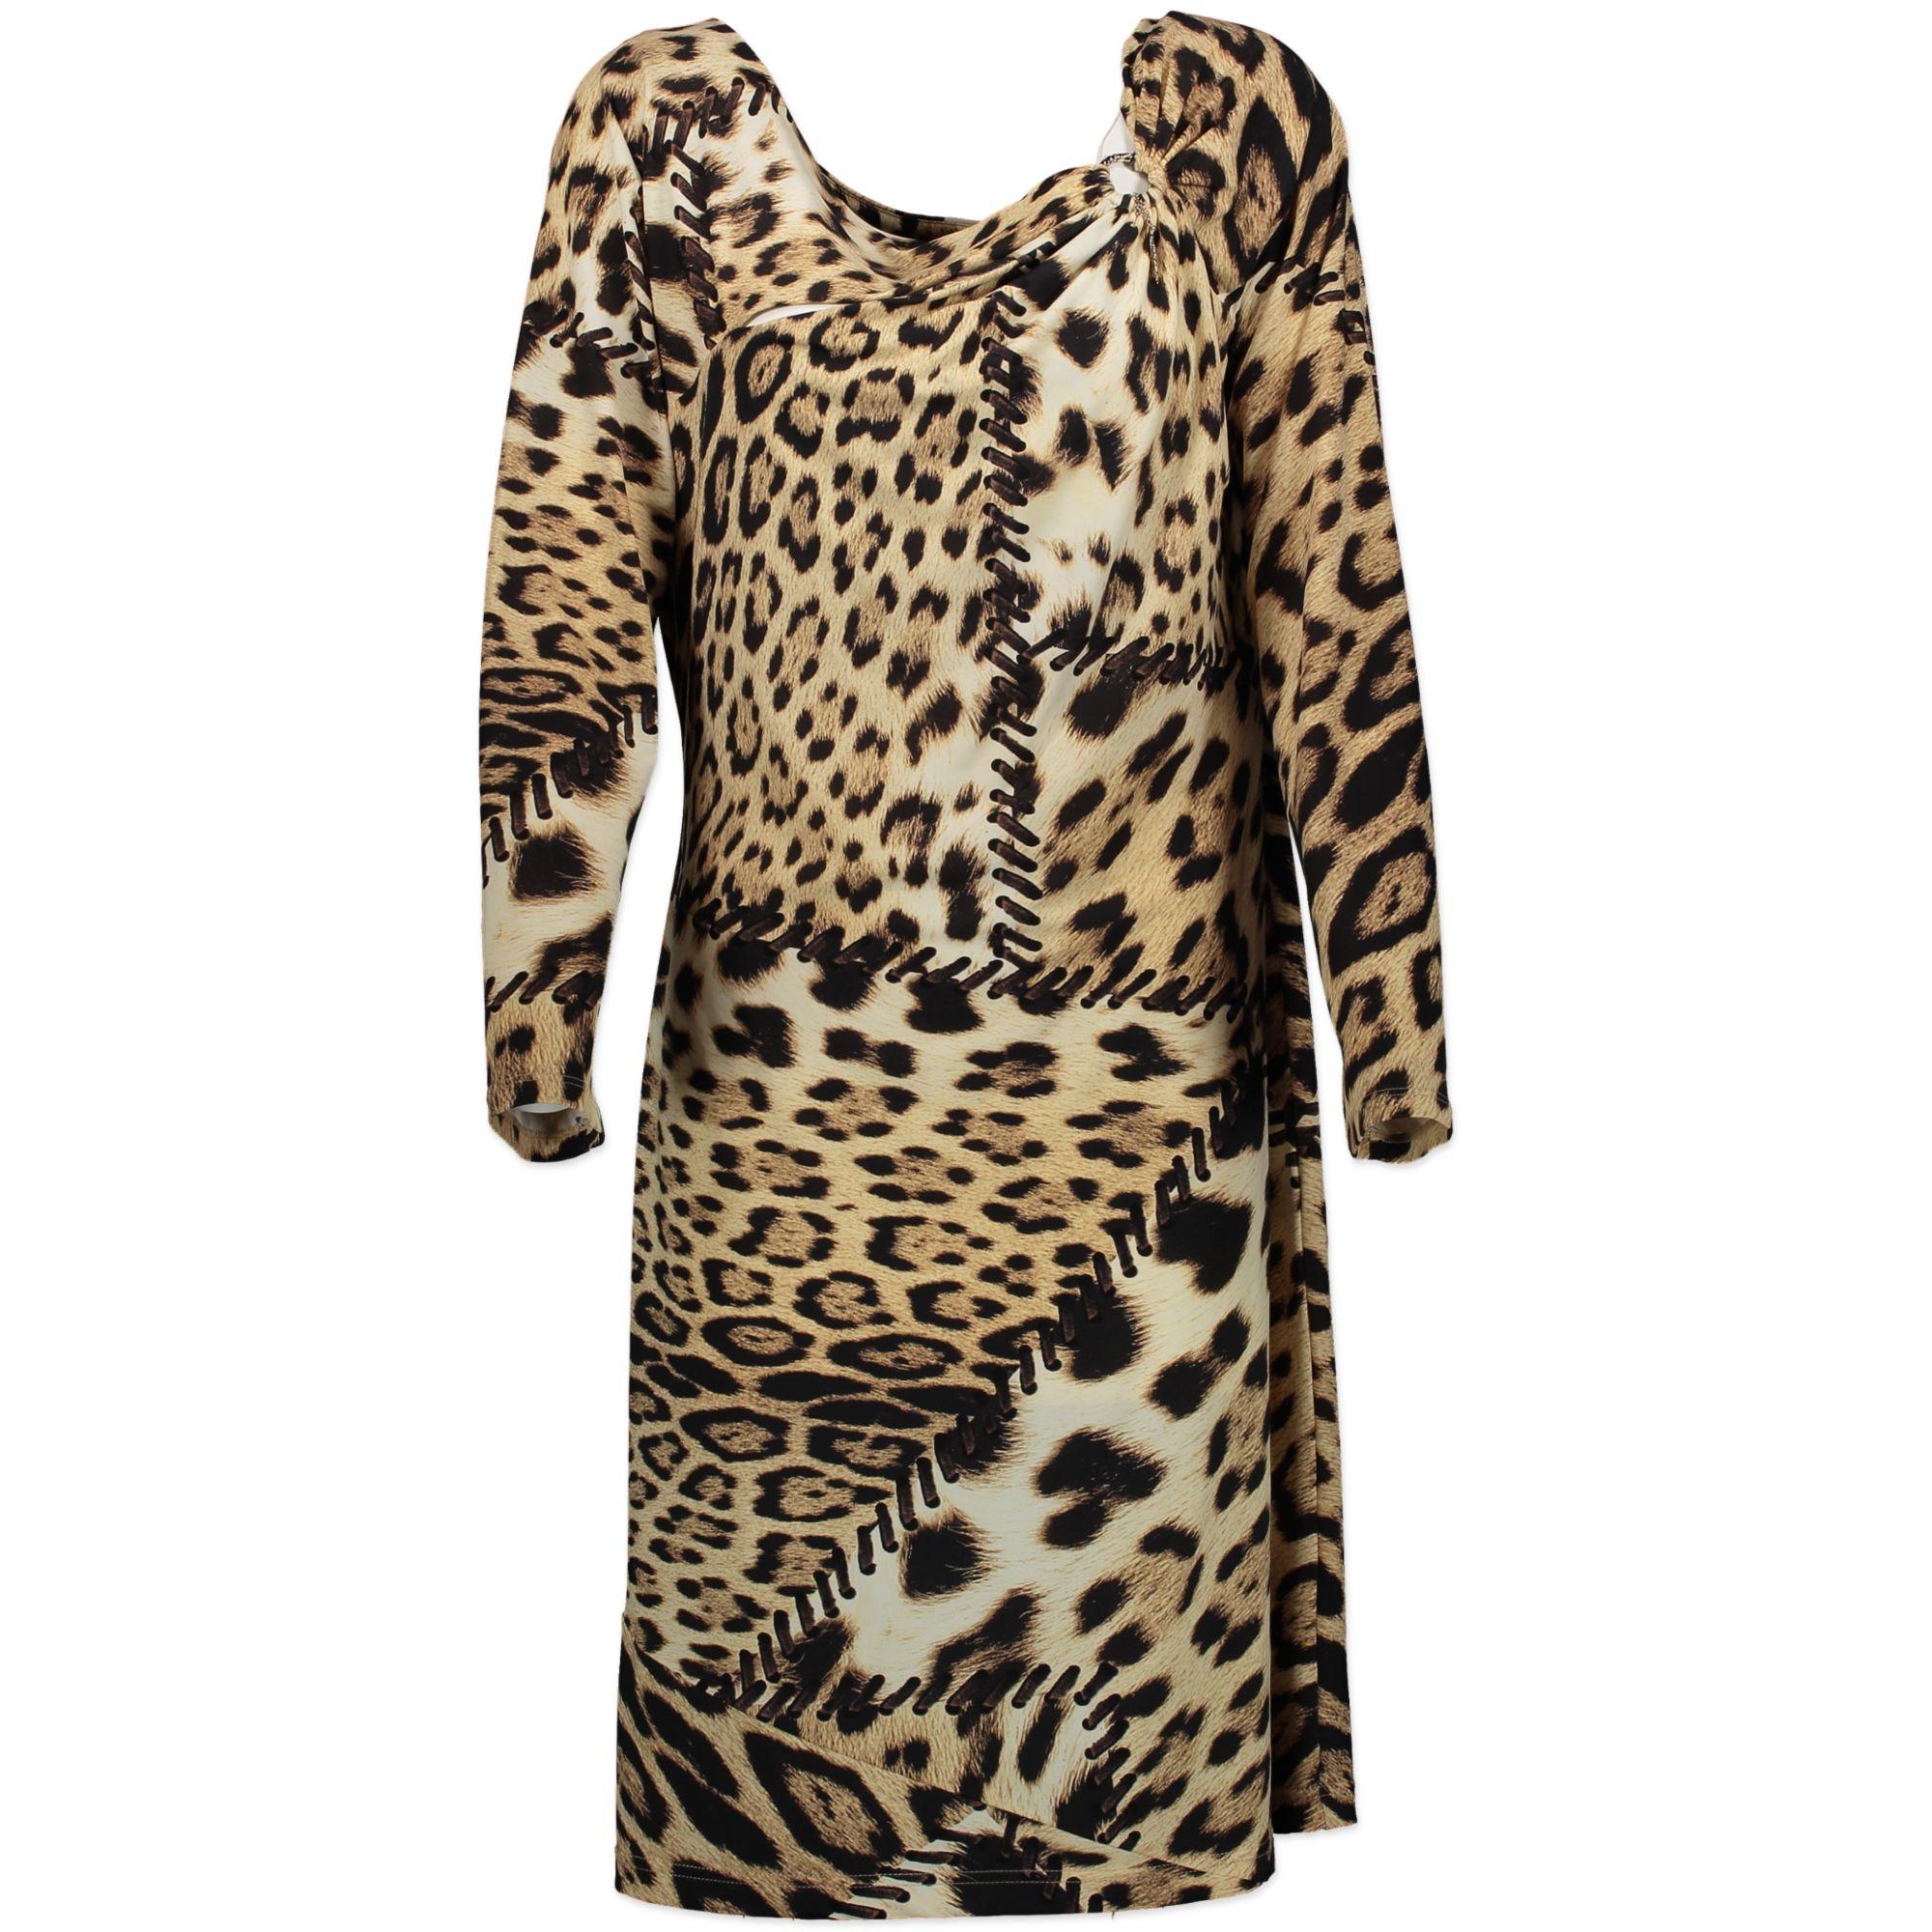 Roberto Cavalli Leopard Print Bodycon Dress